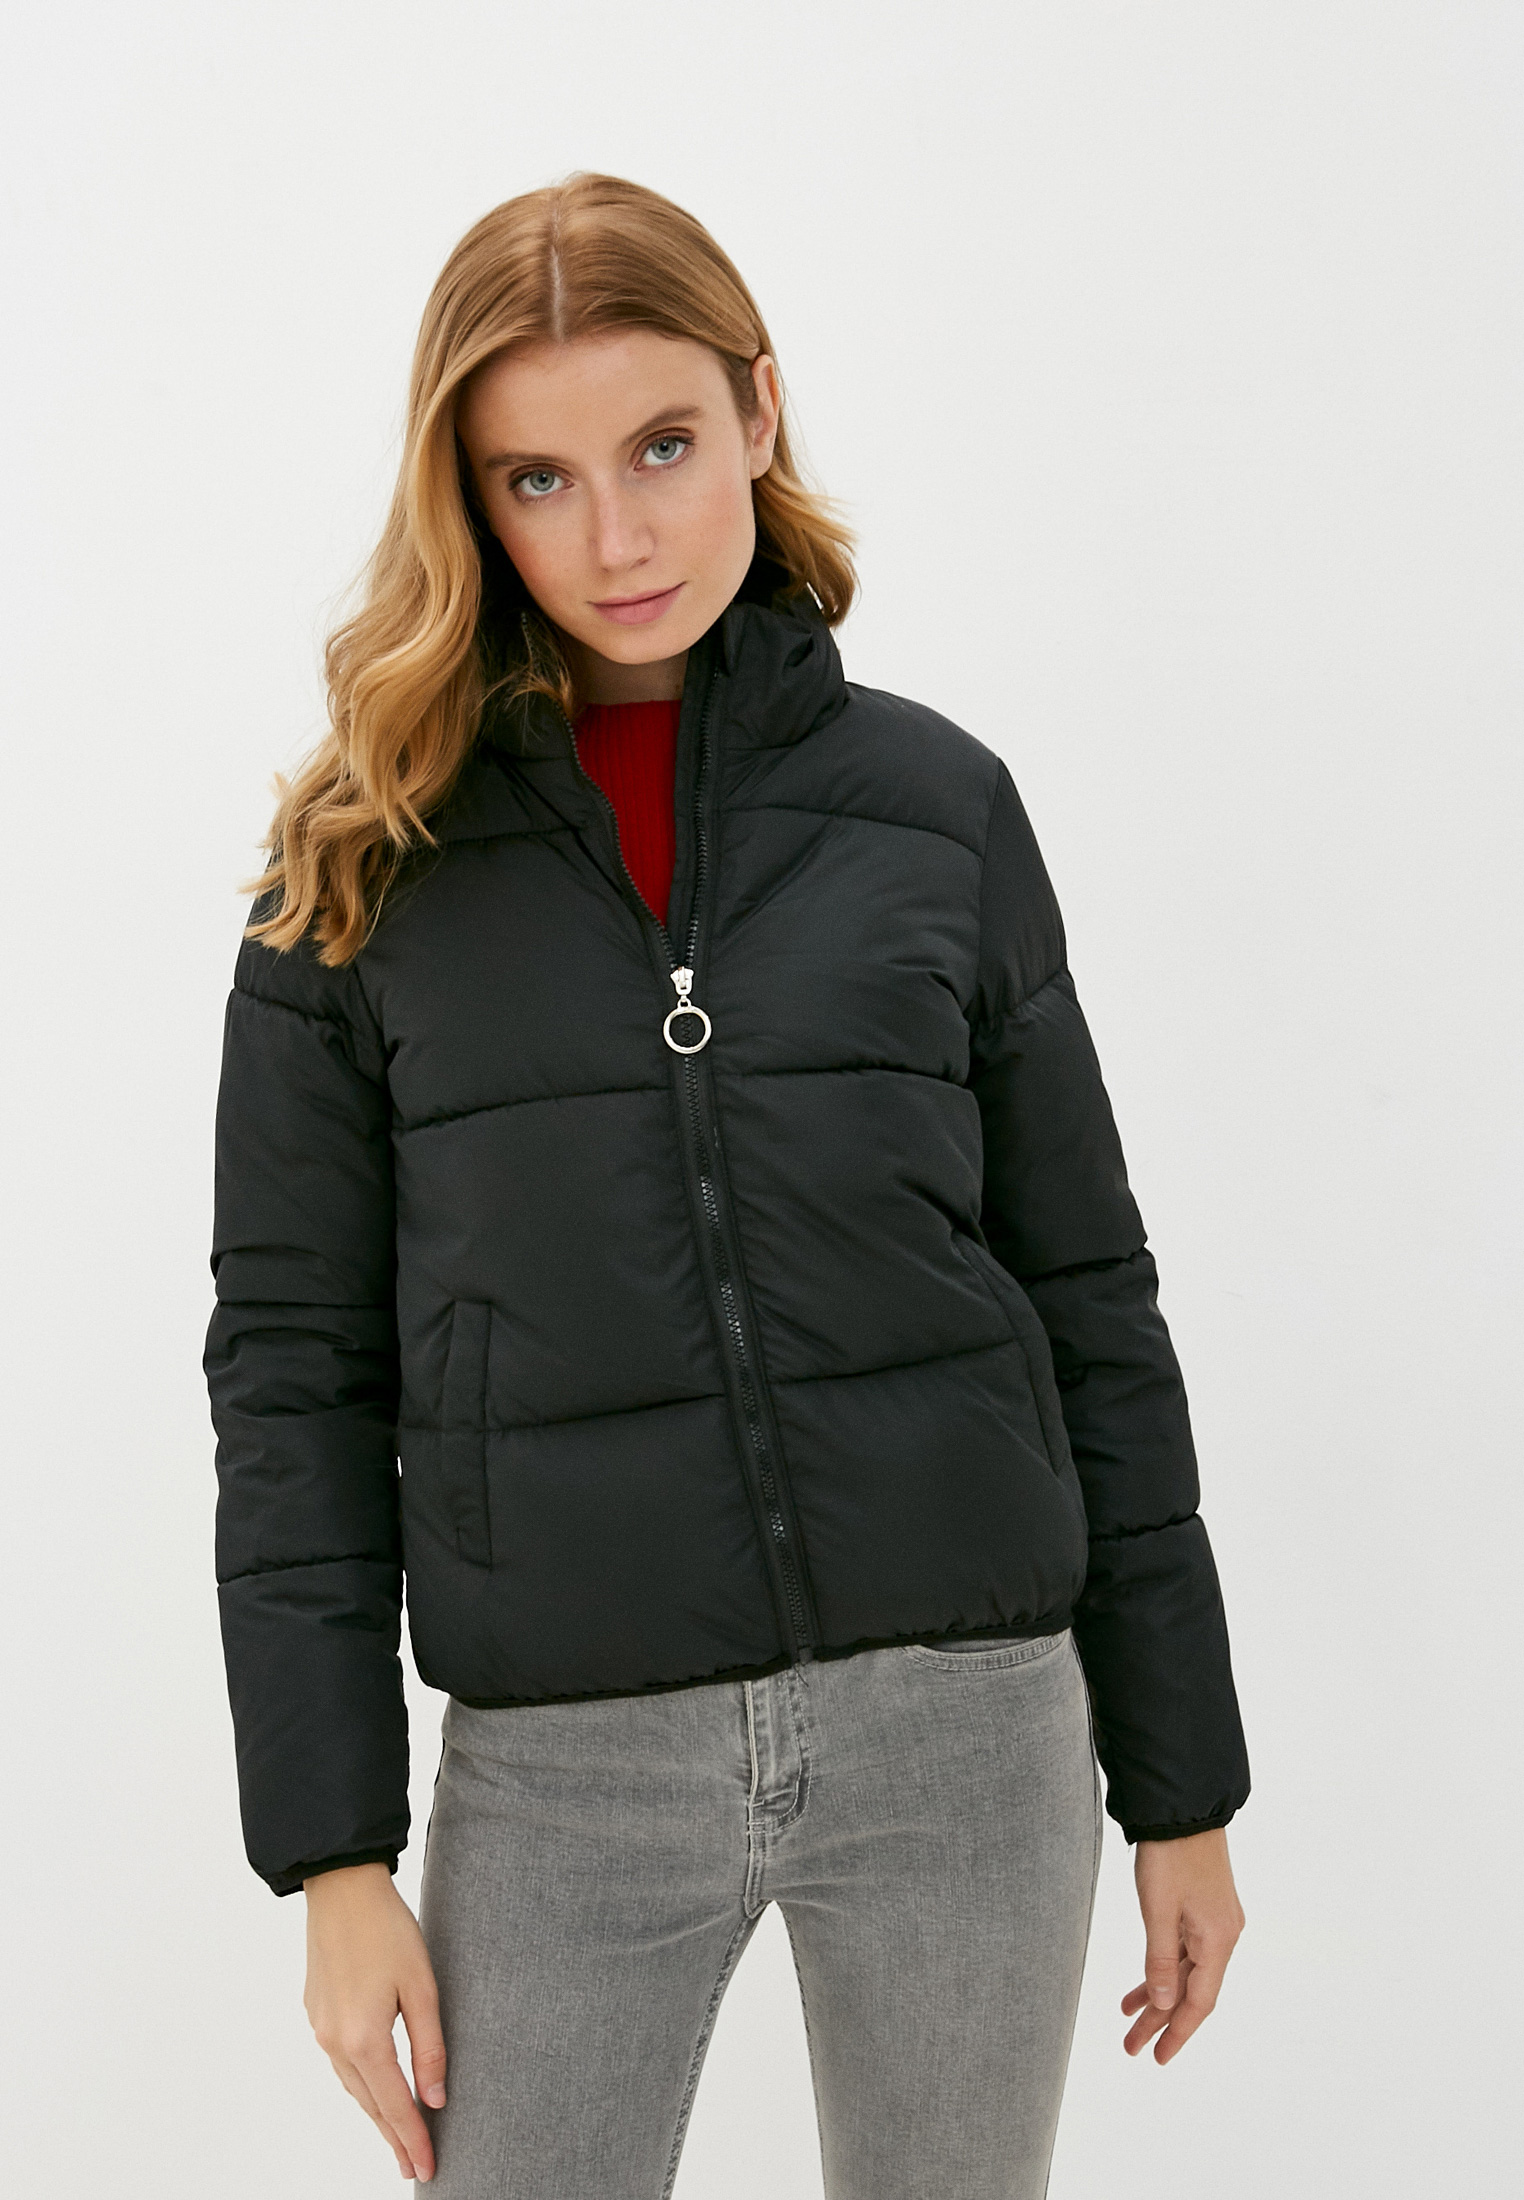 Куртка Miss Gabby 601